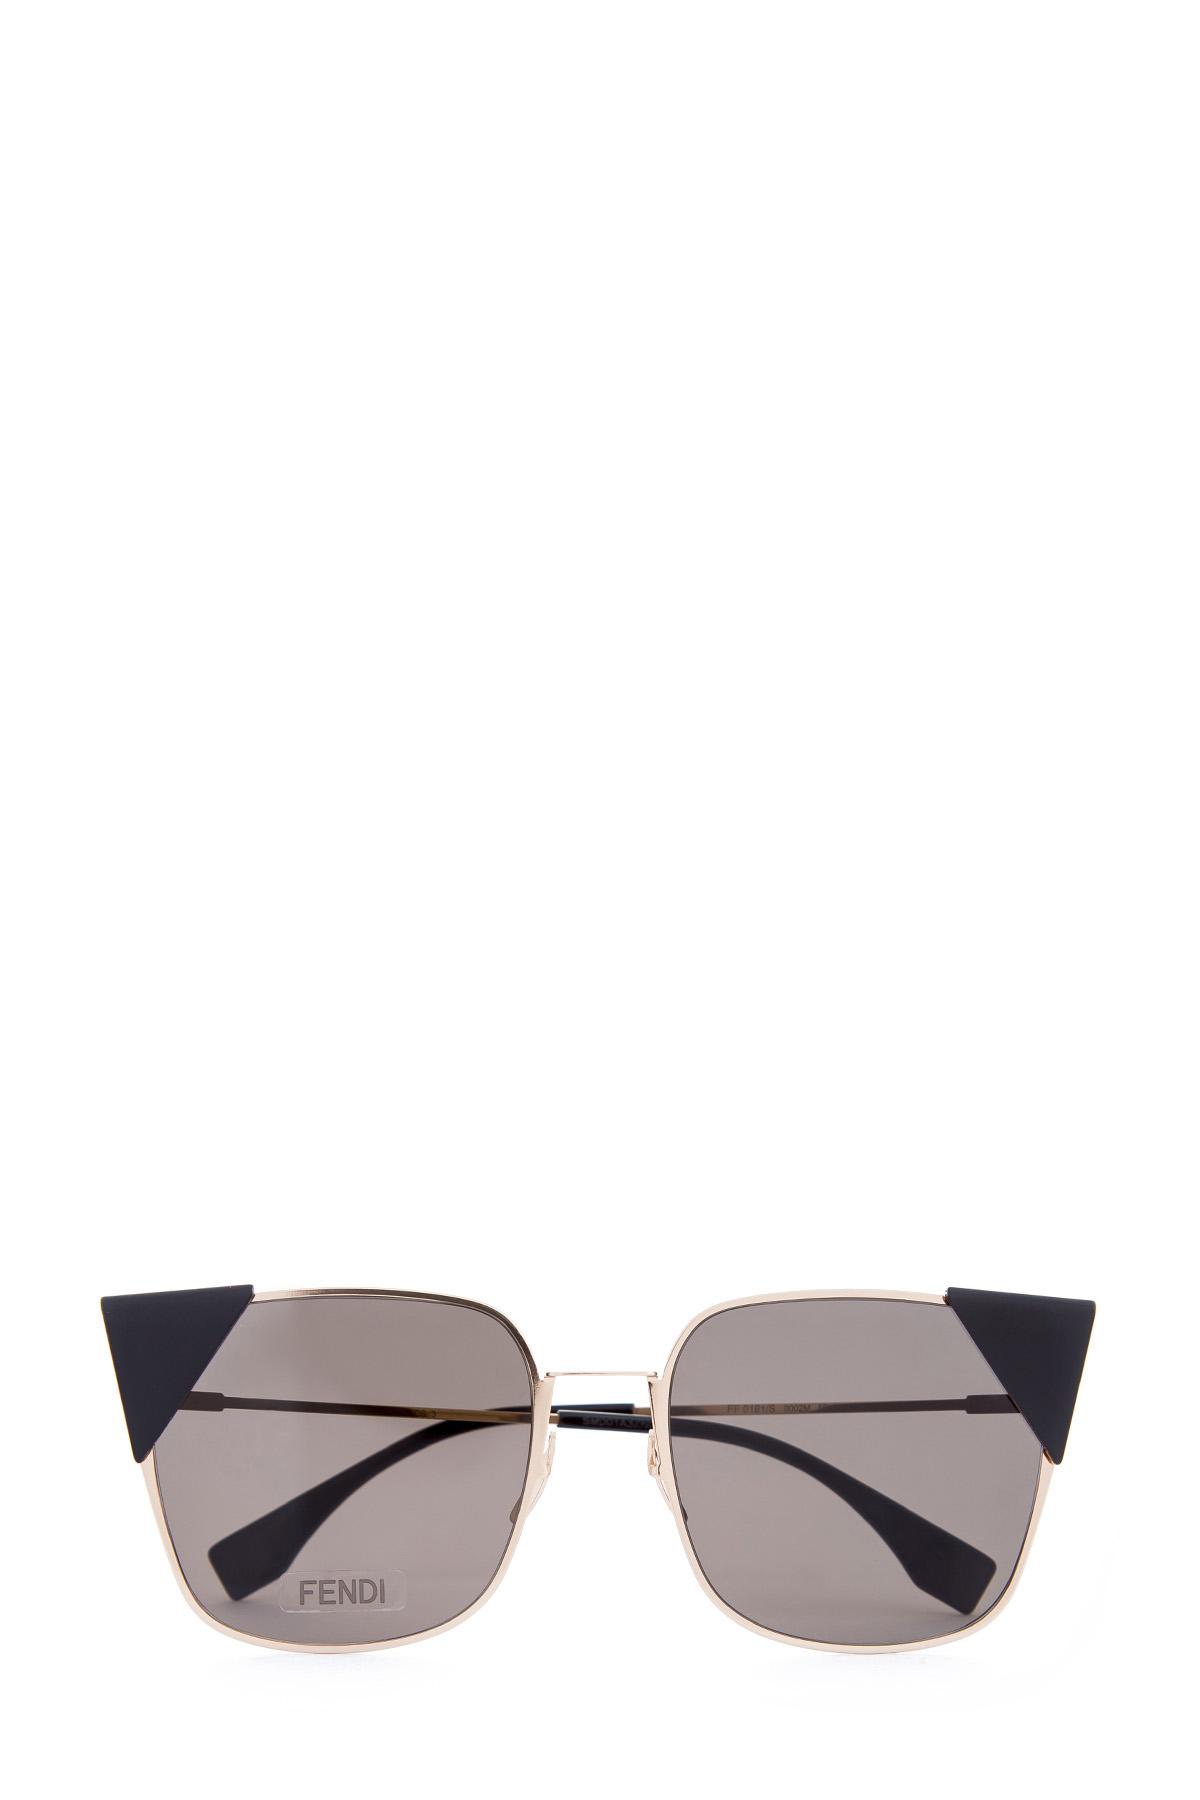 Купить Очки, FENDI (sunglasses), Италия, пластик 100%, стекло 100%, металл 100%